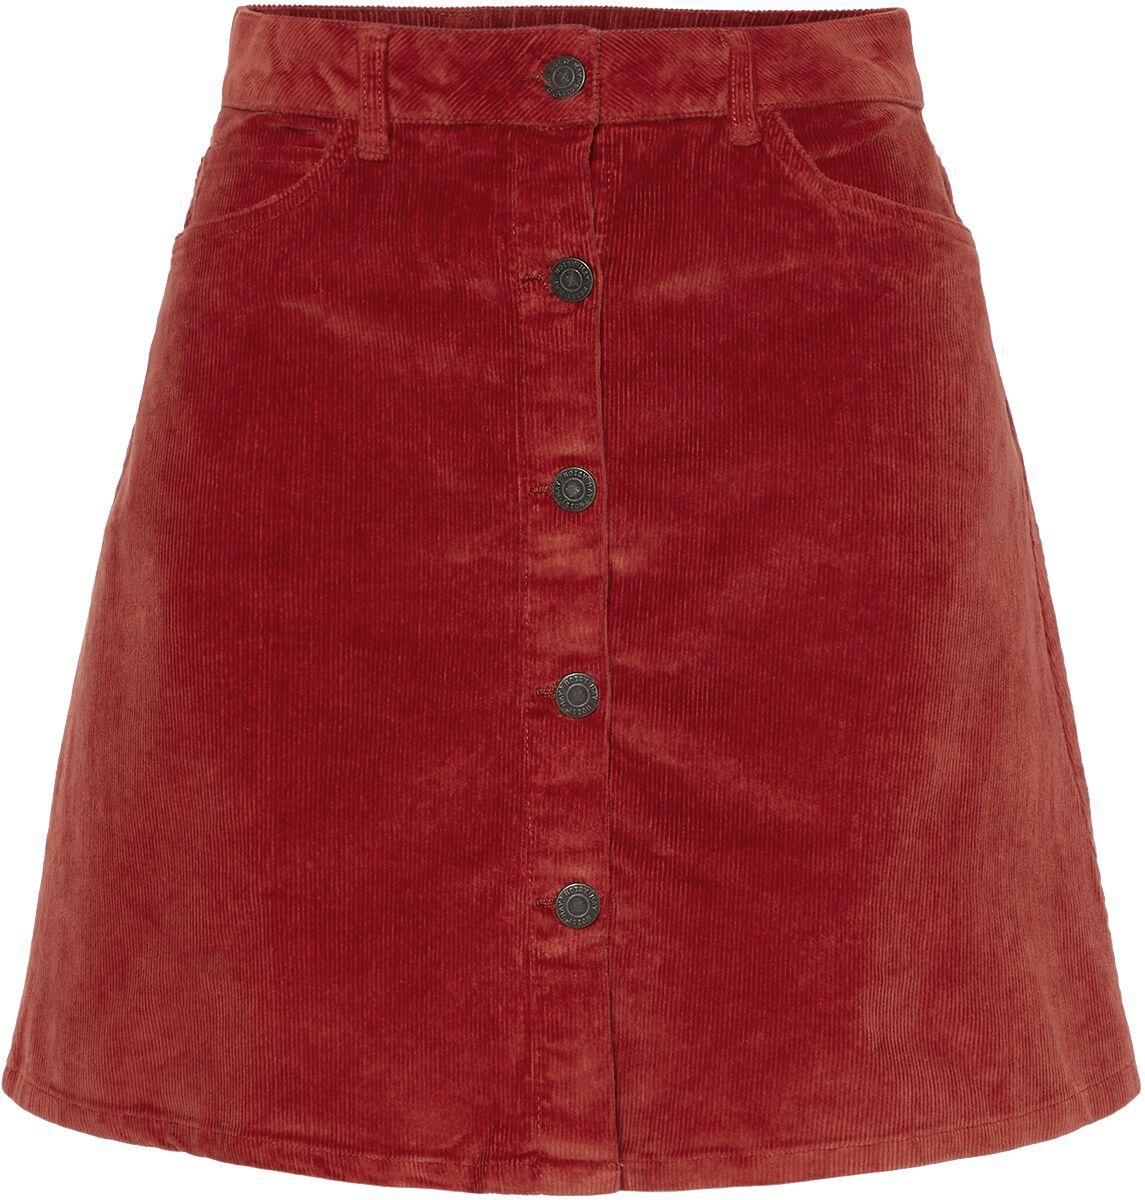 Roecke - Noisy May Sunny Short Curduroy Skirt Kurzer Rock rost  - Onlineshop EMP